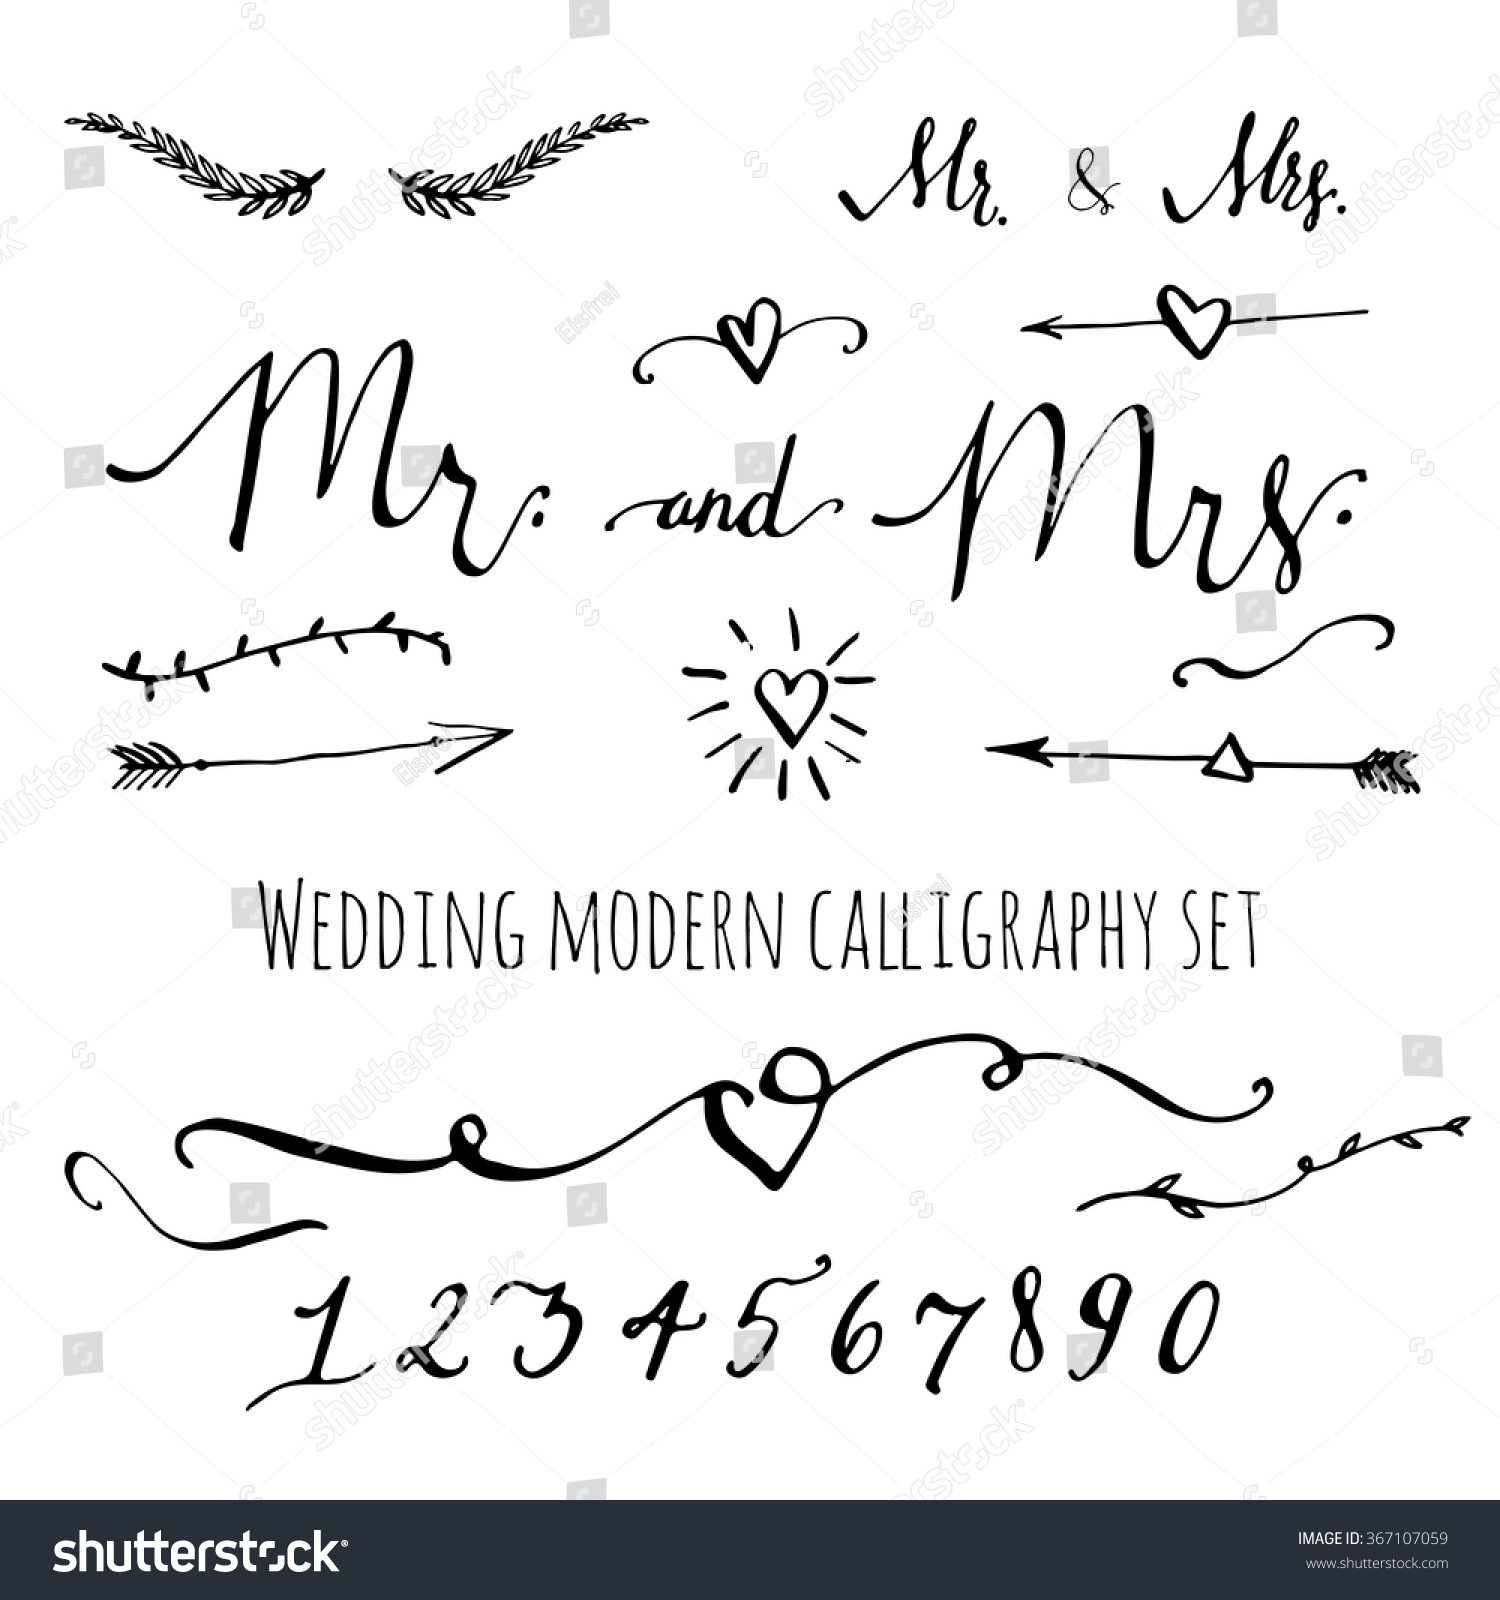 Wedding modern calligraphy decorative elements set stock